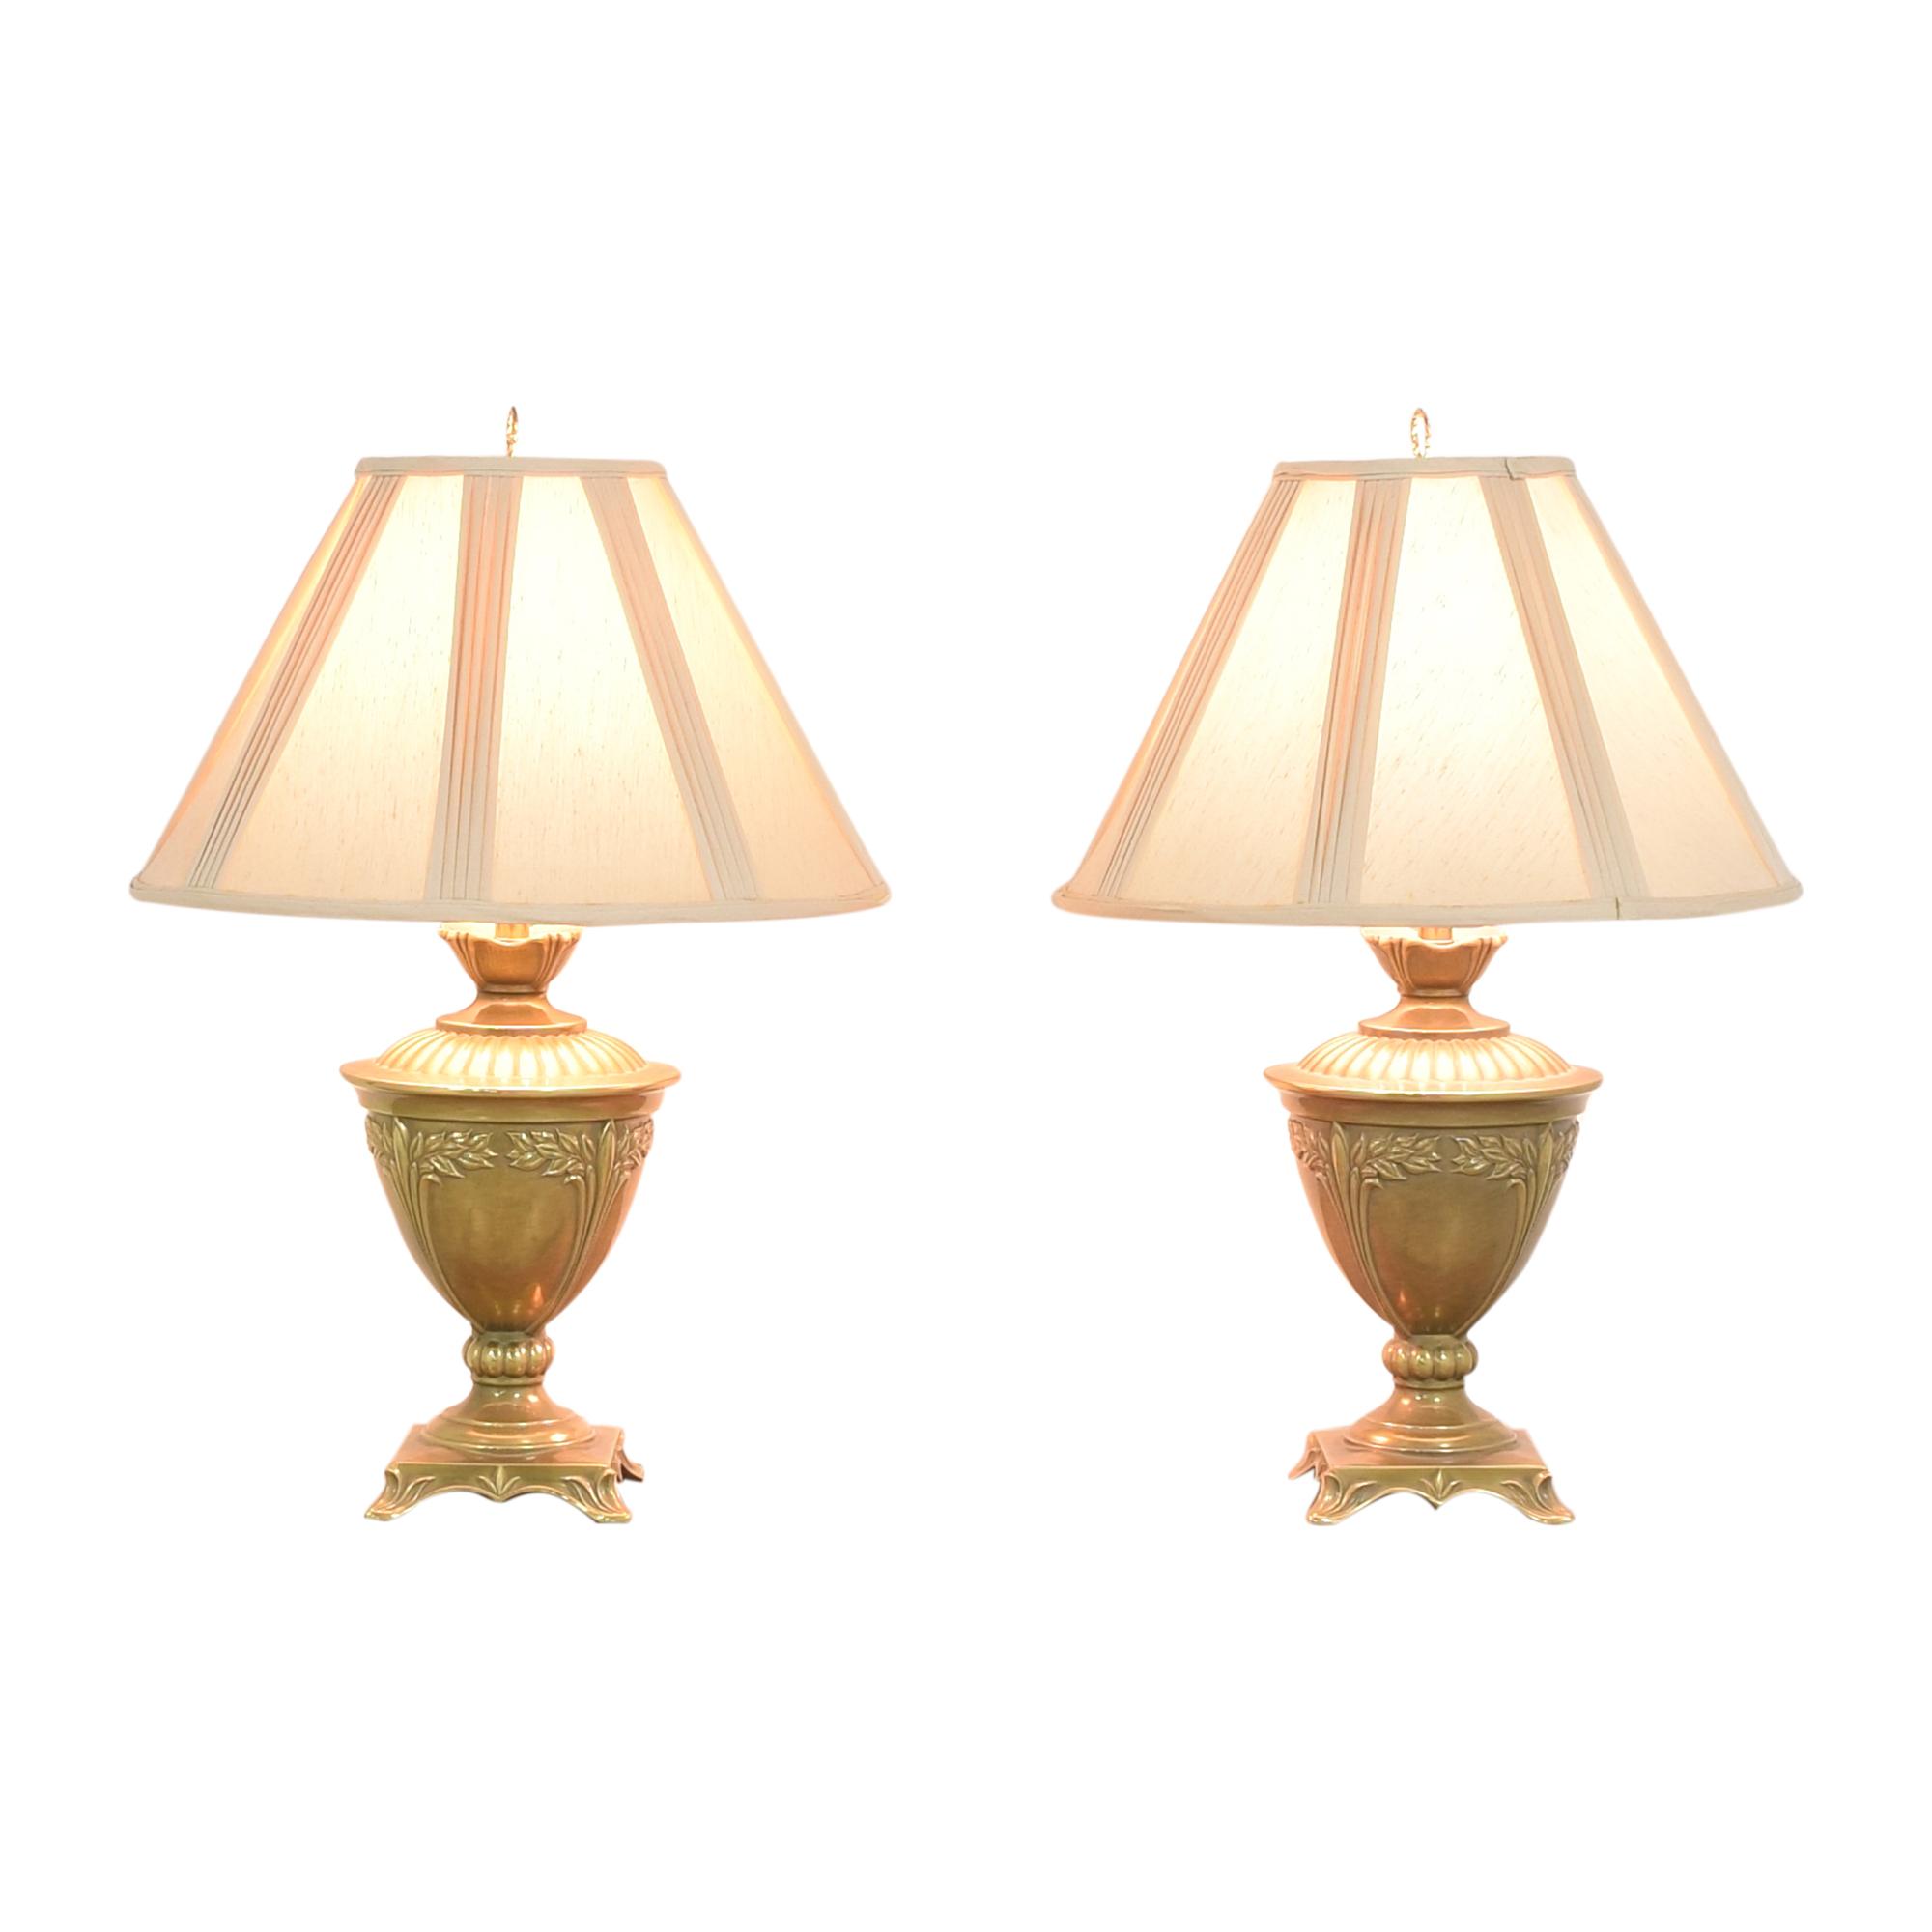 buy Ethan Allen Urn Table Lamps Ethan Allen Decor